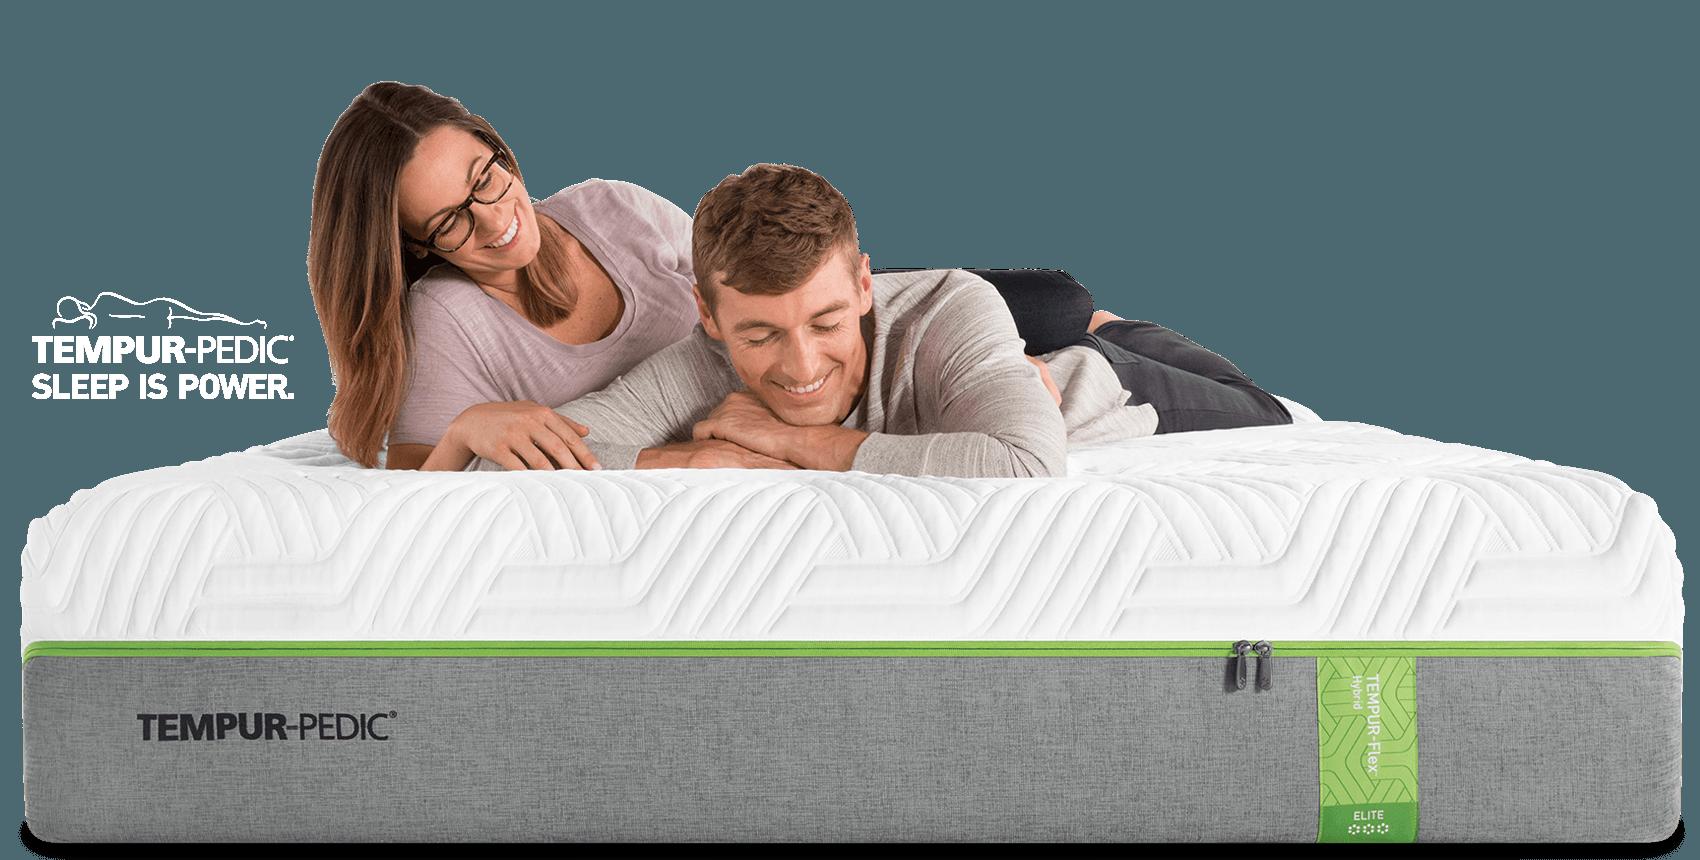 learn what makes tempurpedic unique mattresses overview - Tempur Pedic Beds